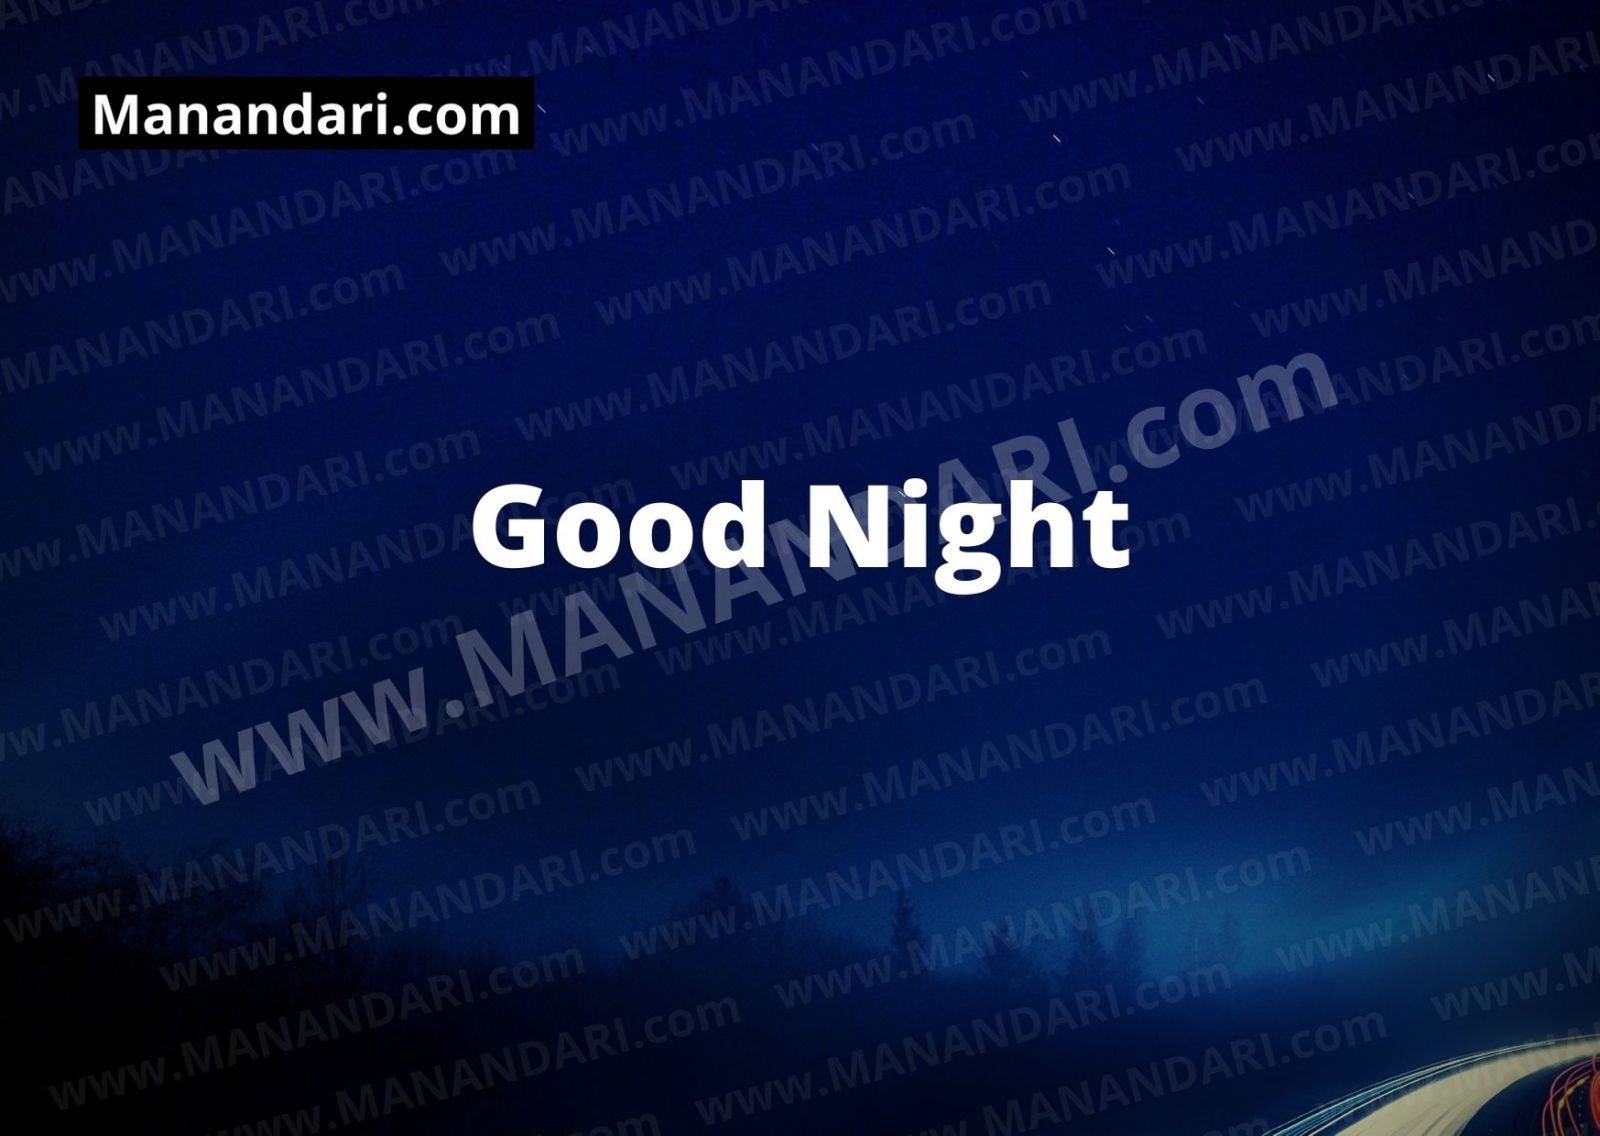 Good Night - 16